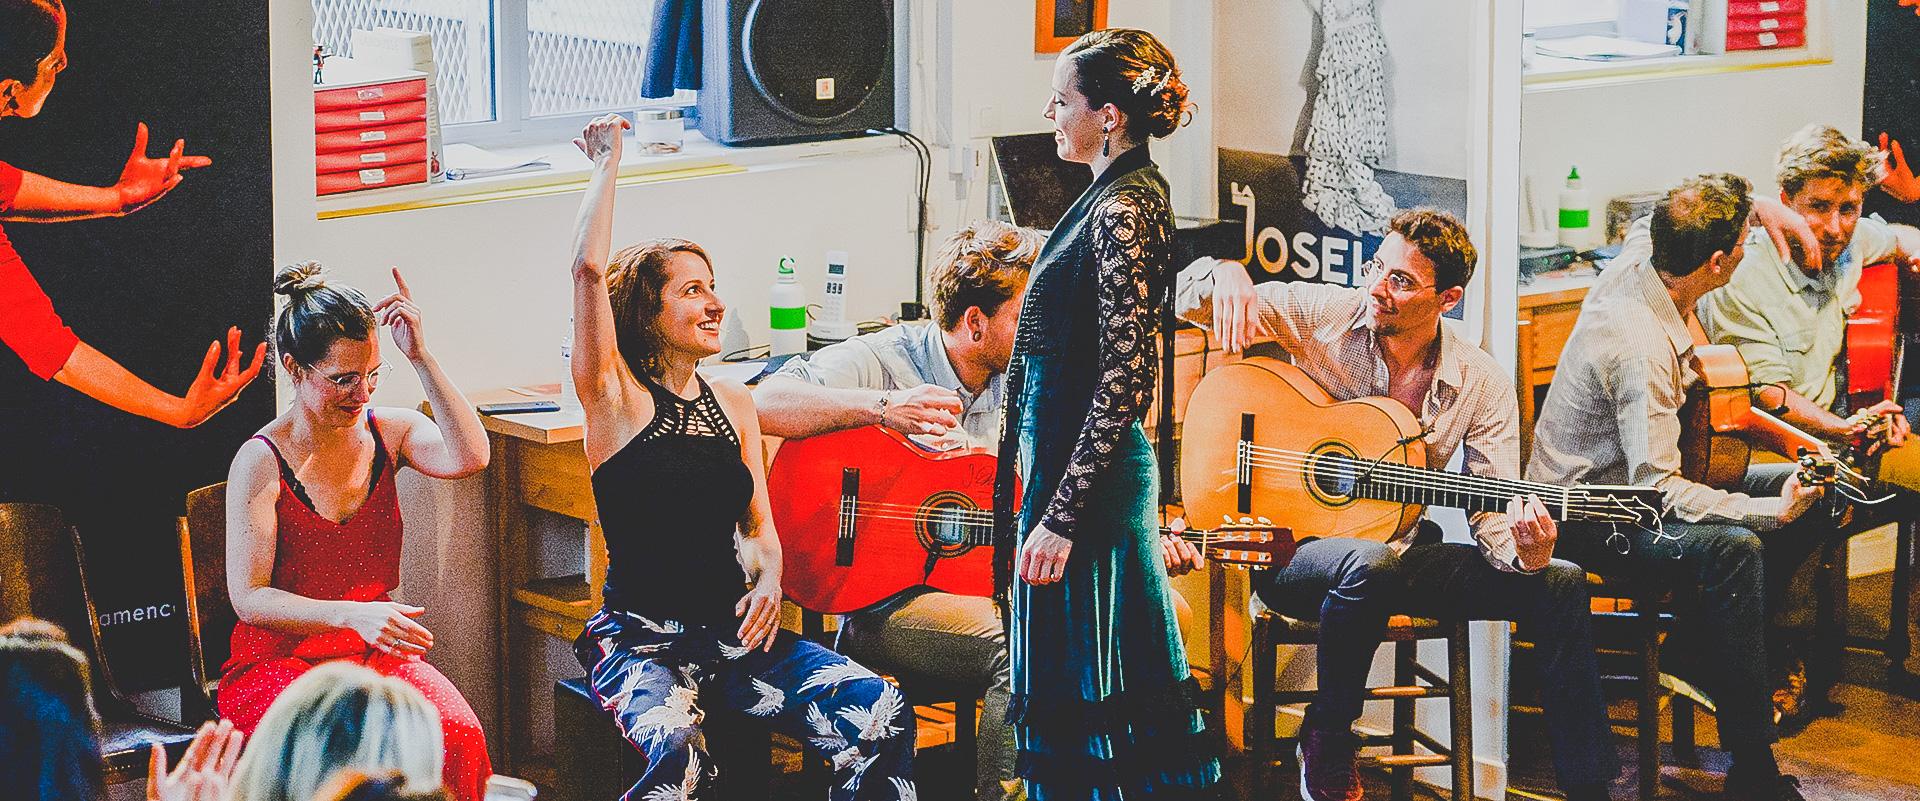 professeurs_ecole_flamenco_fabrica_flamenco_toulouse